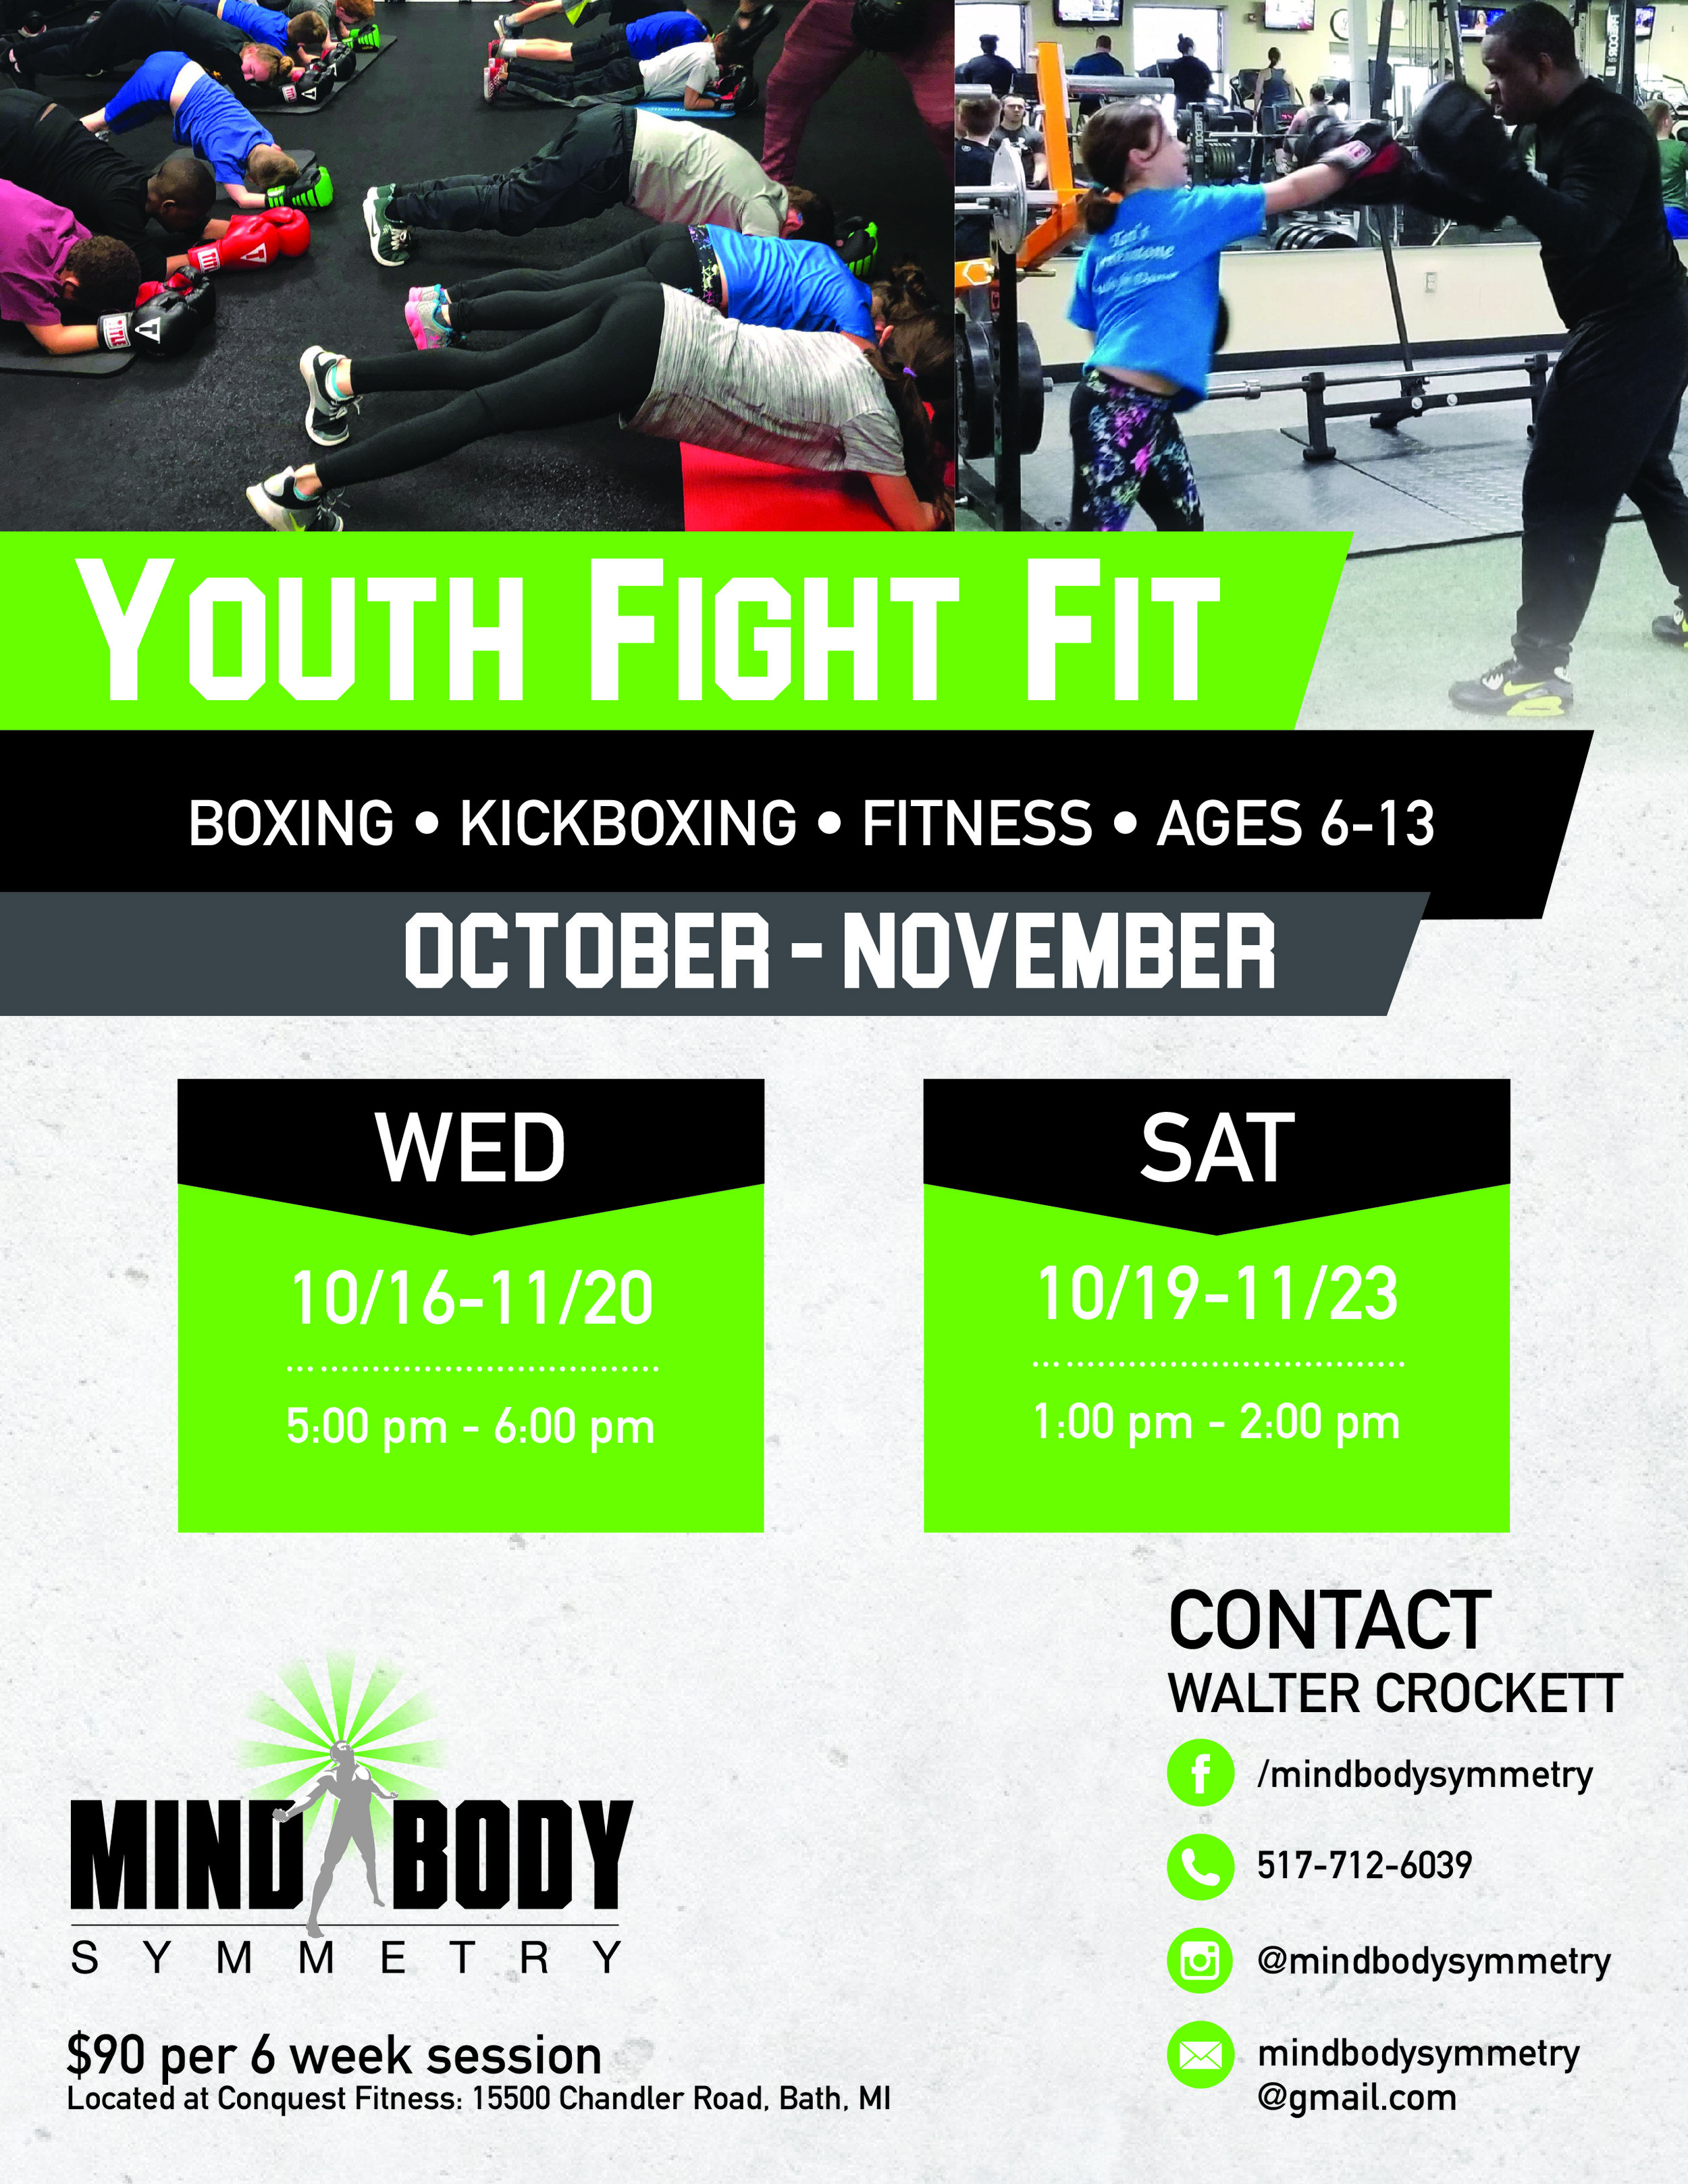 Youth Fight Fit-01octnov19.jpg